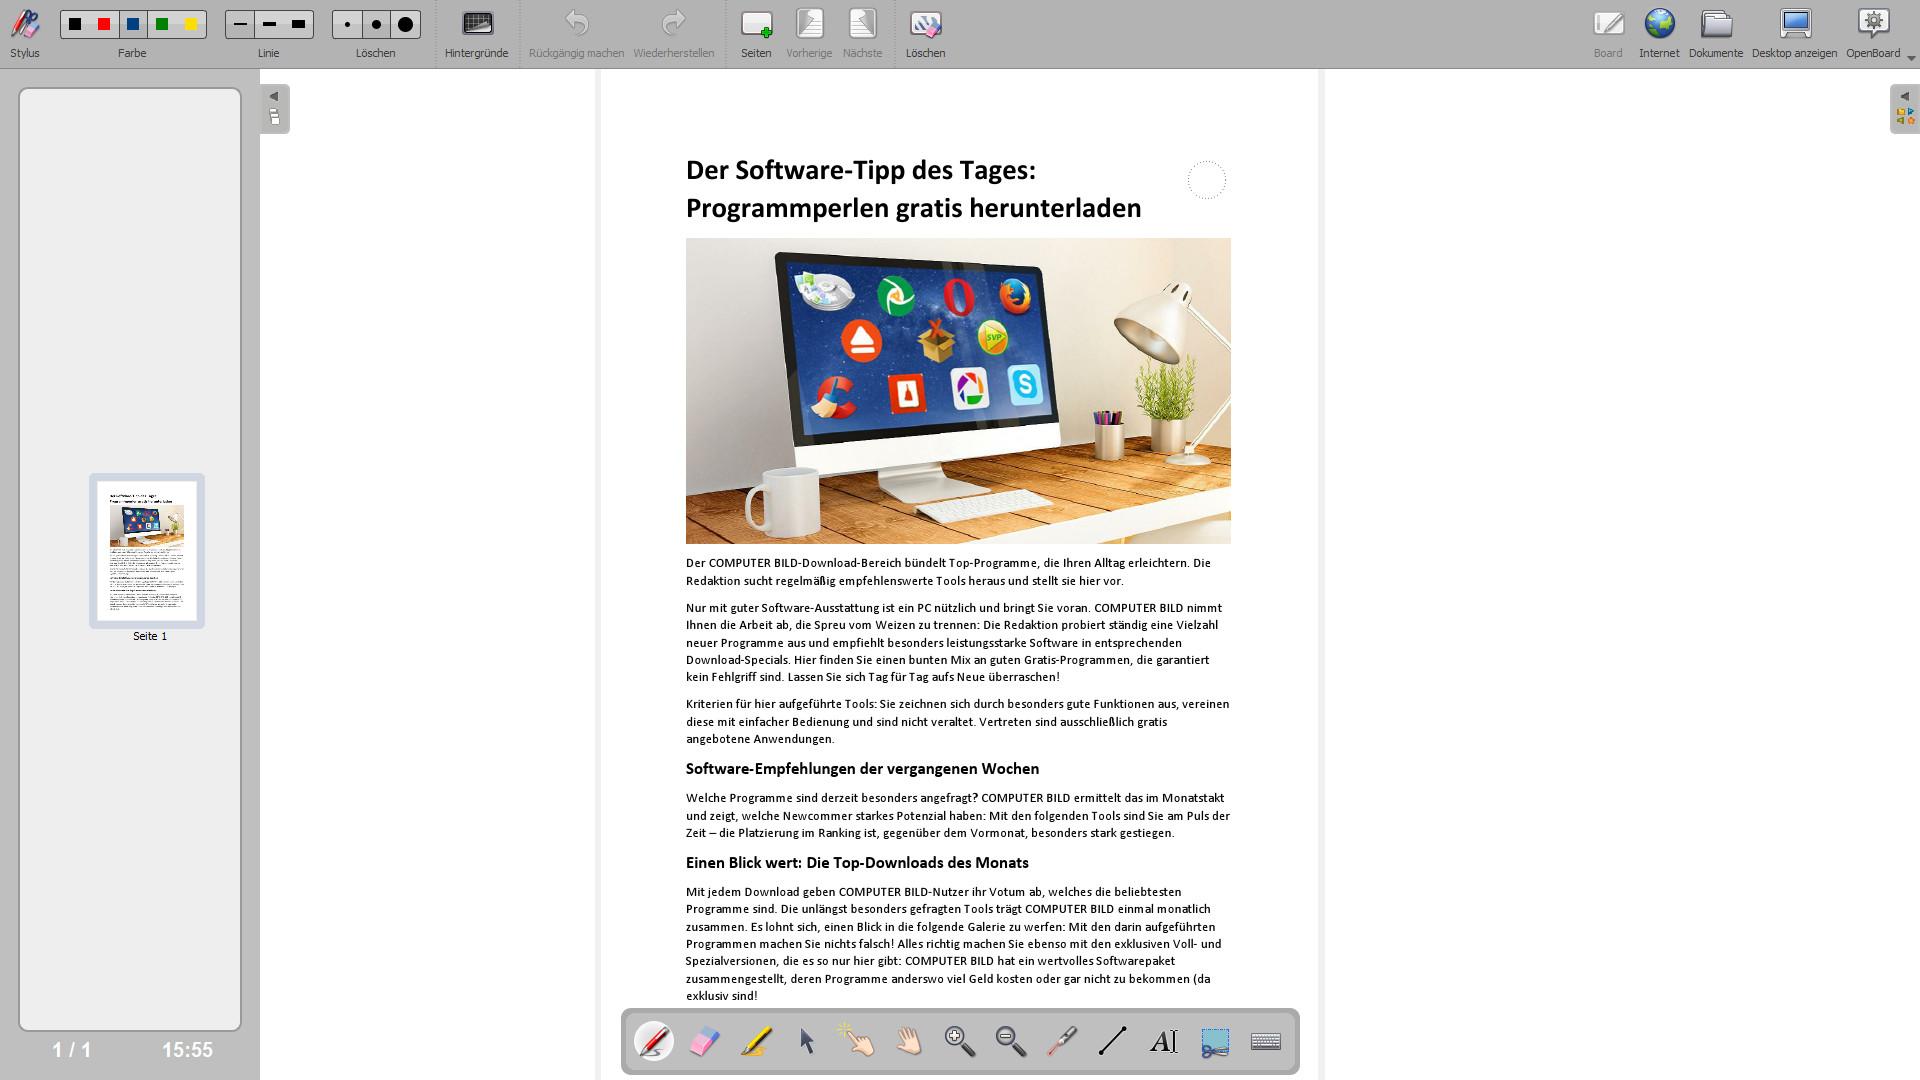 Screenshot 1 - OpenBoard